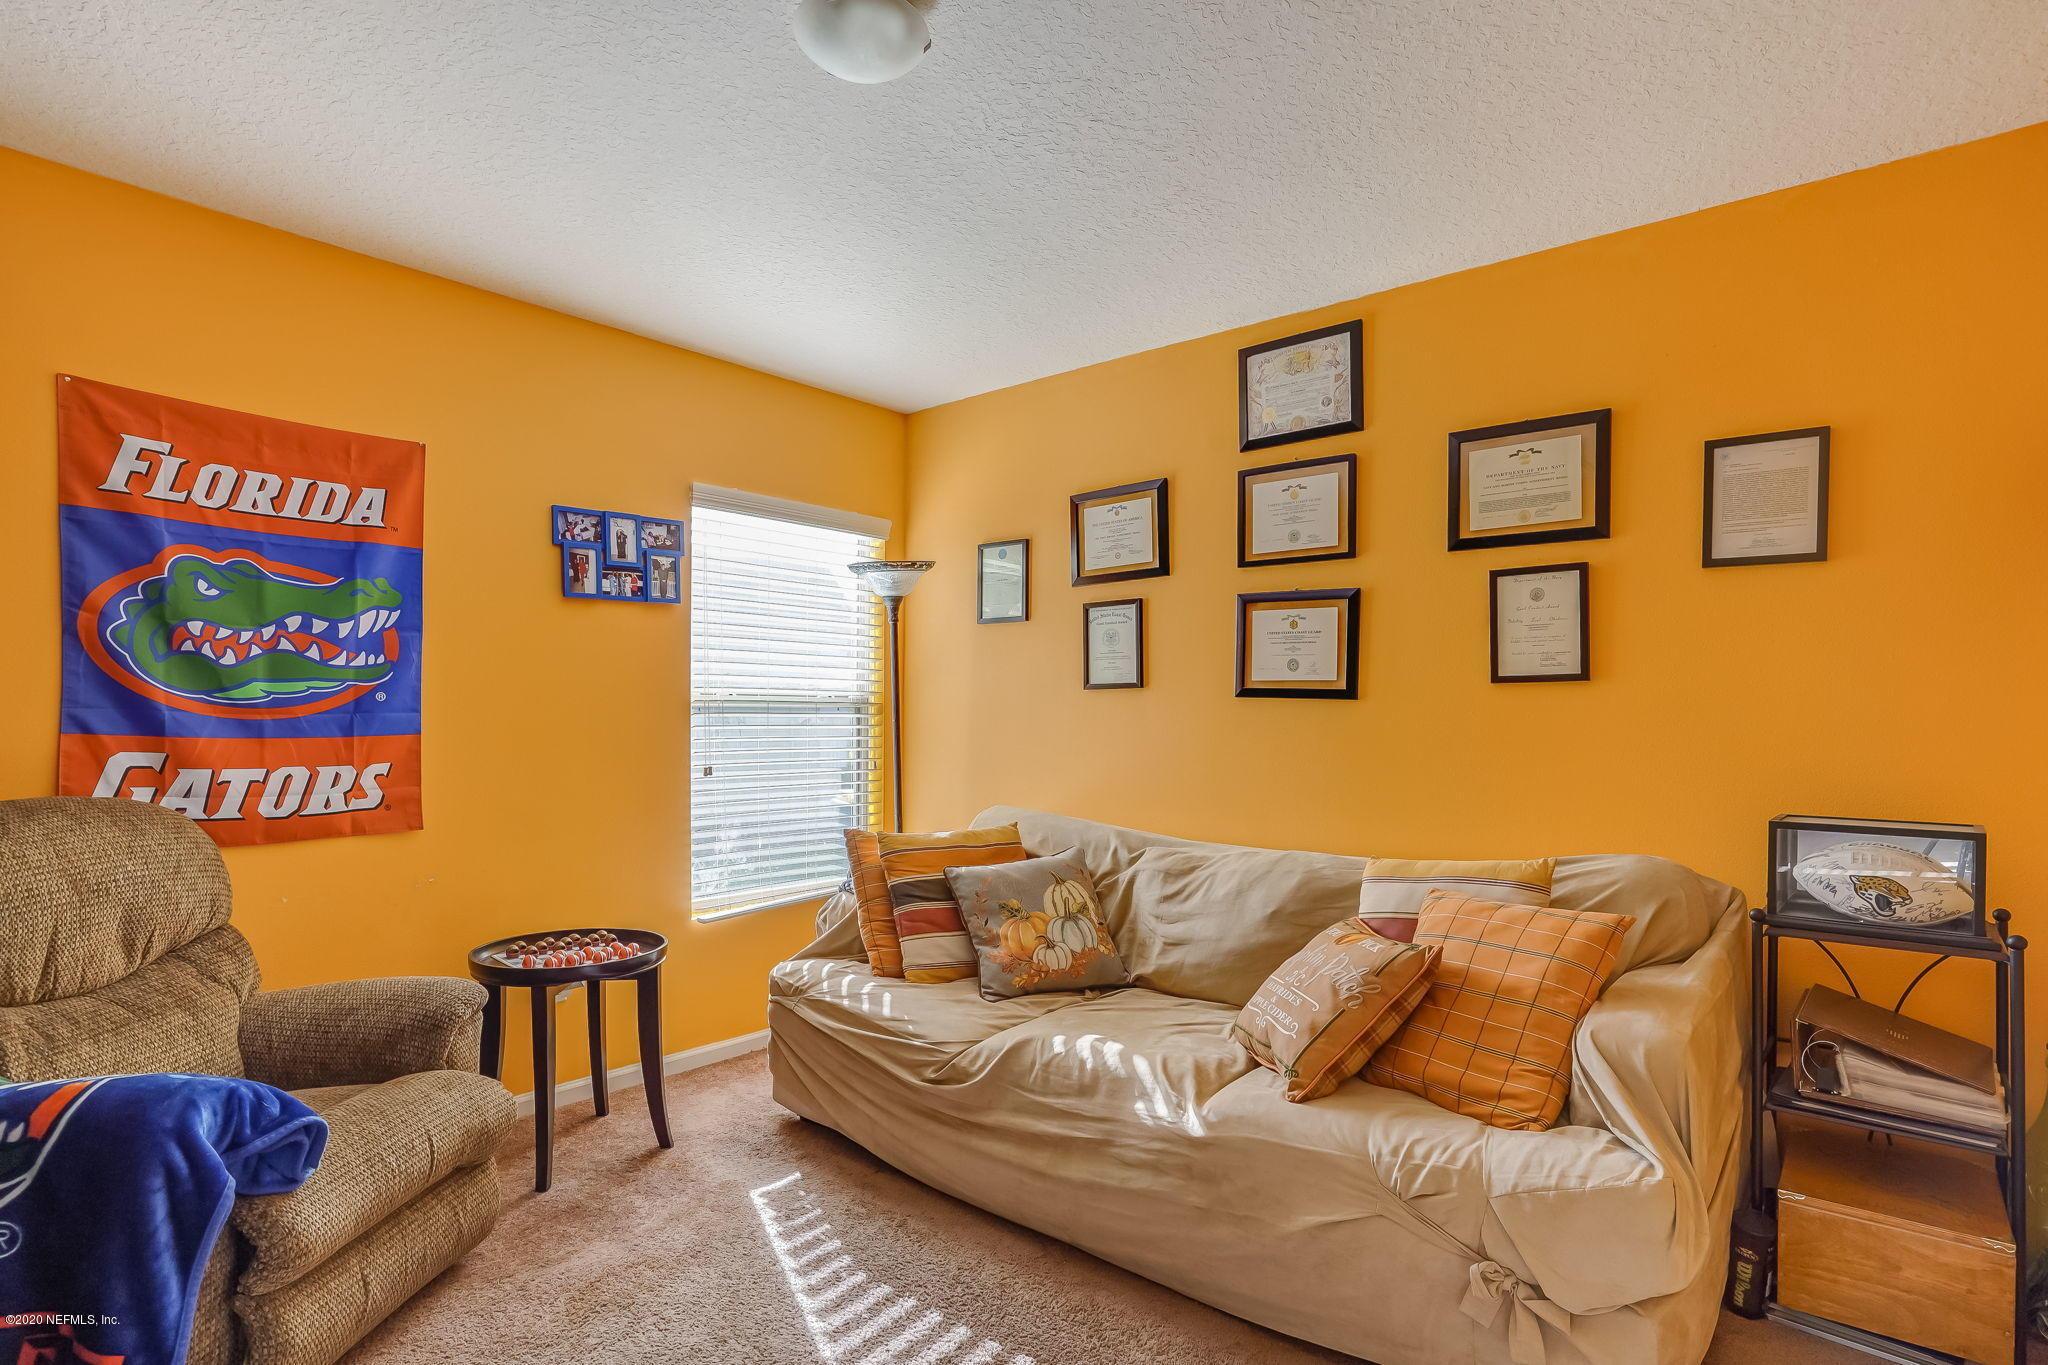 15763 TWIN CREEK, JACKSONVILLE, FLORIDA 32218, 3 Bedrooms Bedrooms, ,2 BathroomsBathrooms,Residential,For sale,TWIN CREEK,1081758